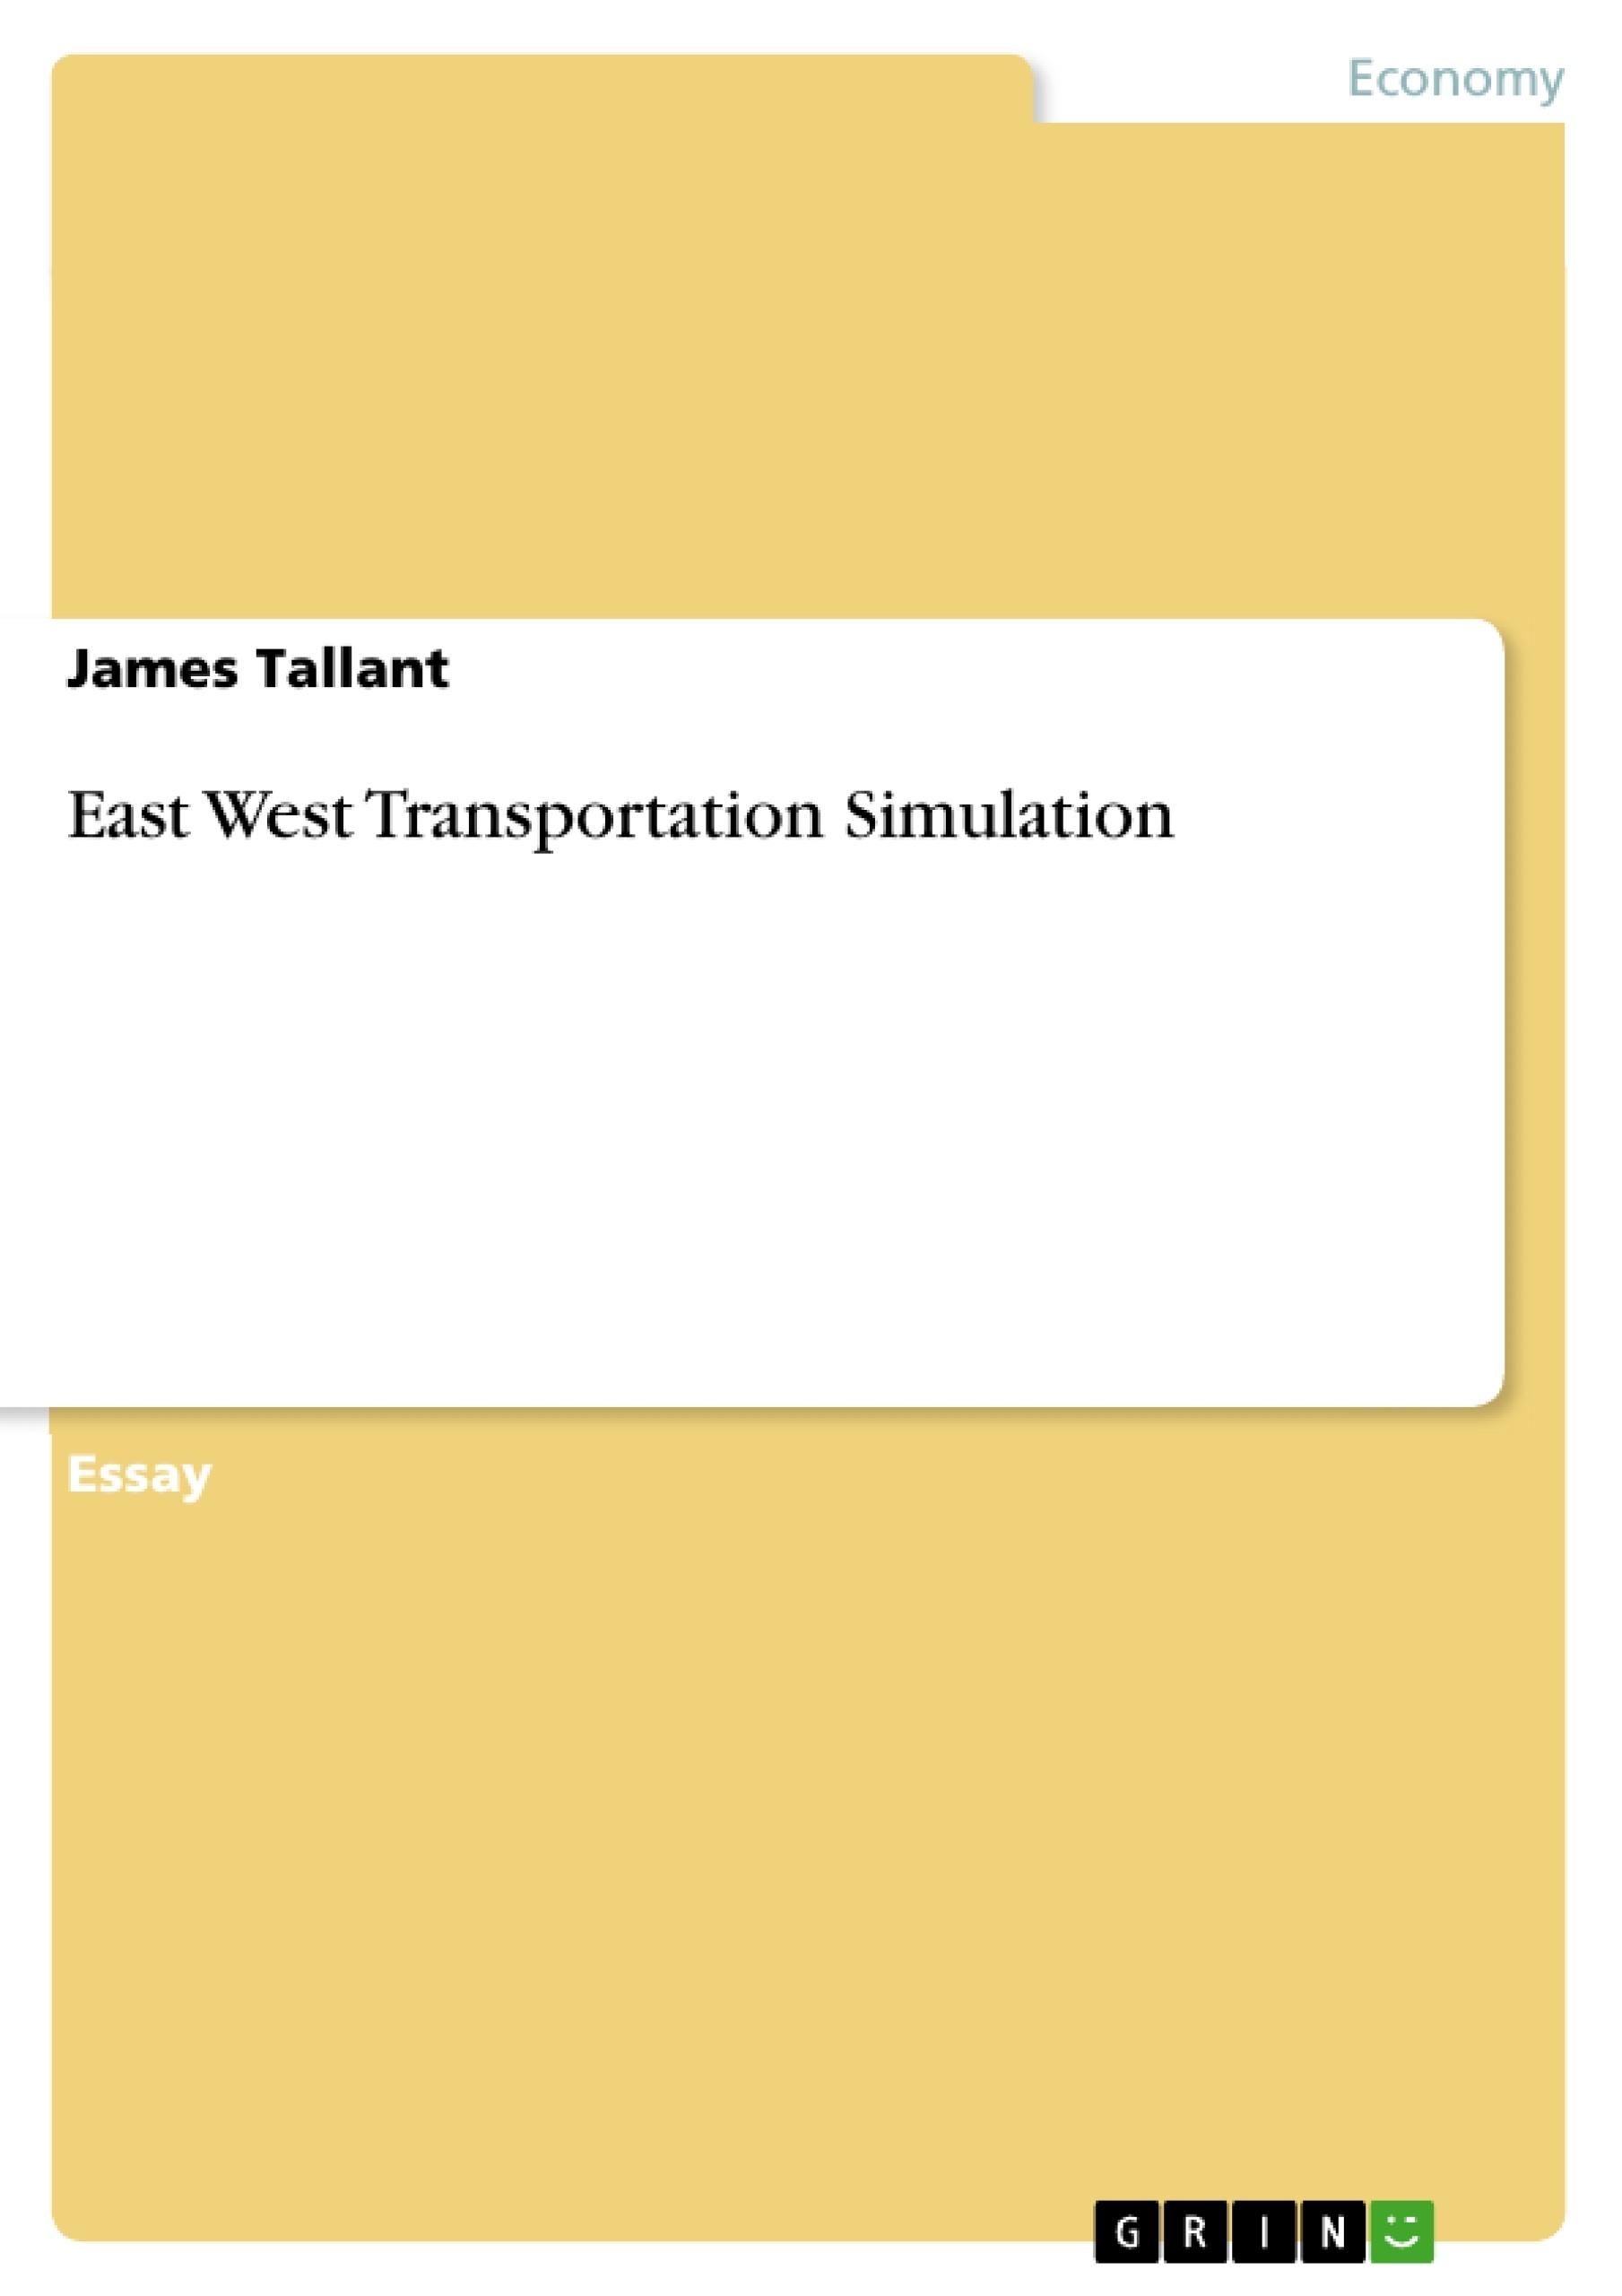 Title: East West Transportation Simulation